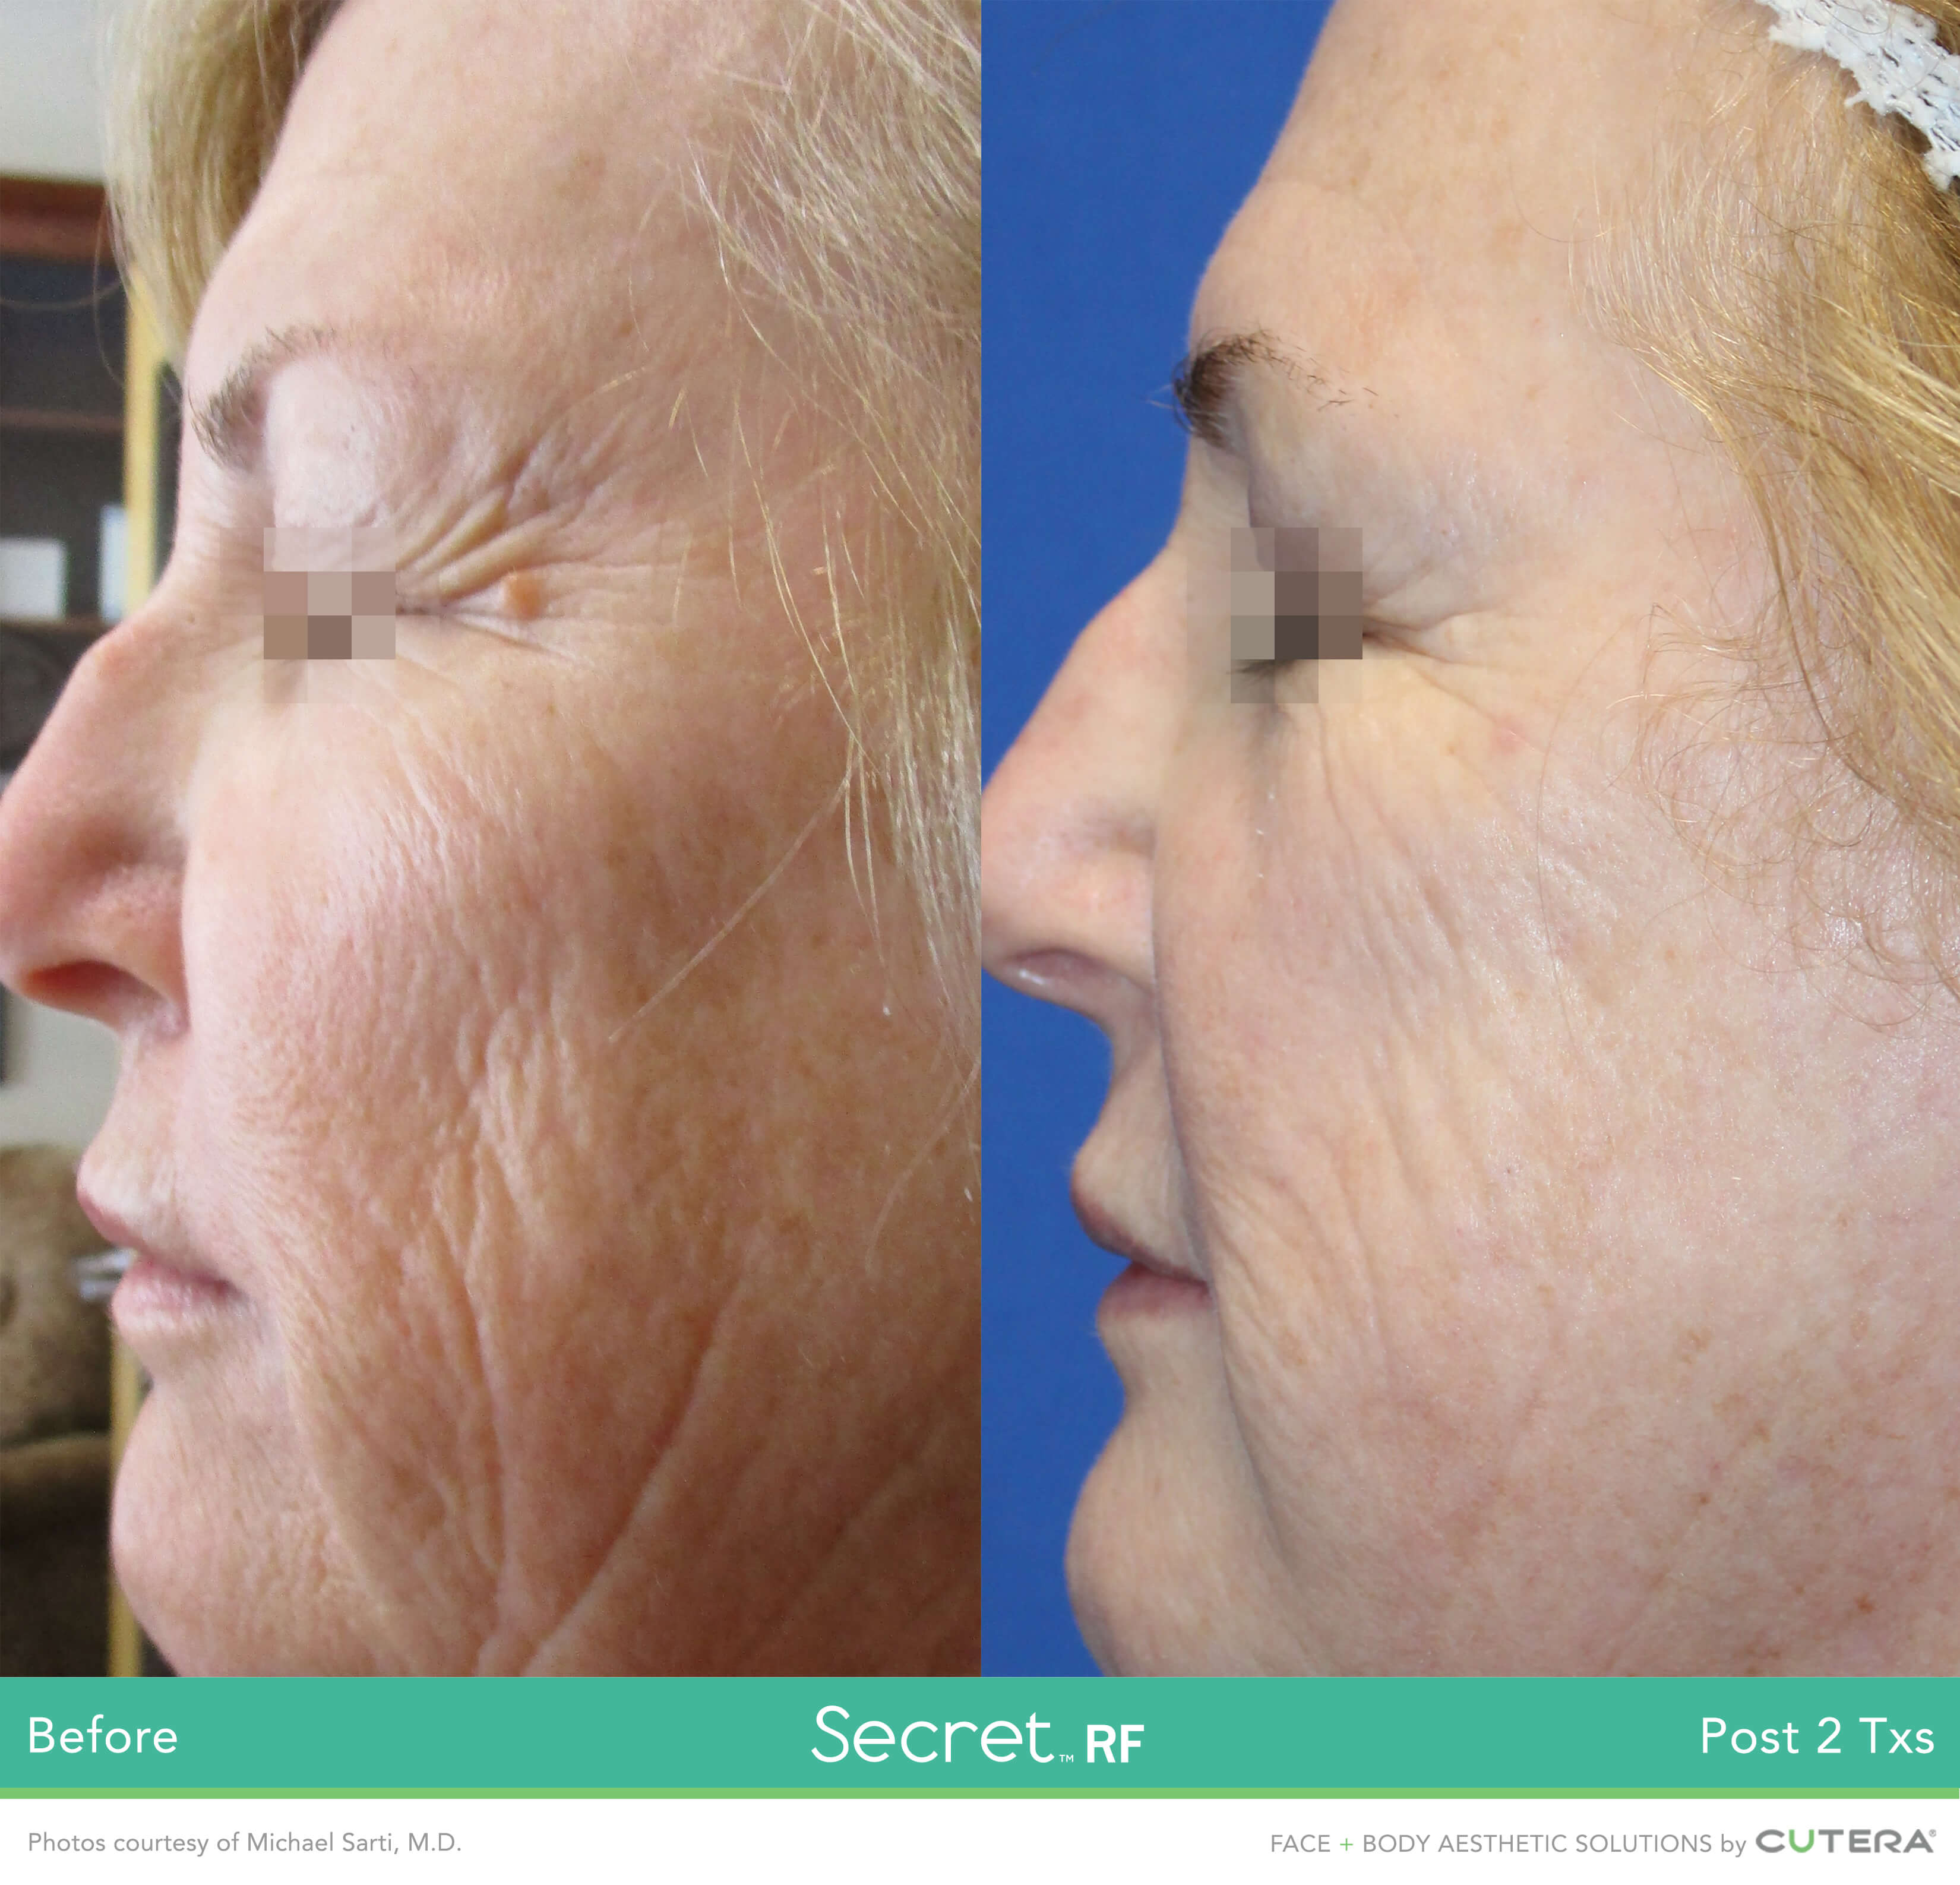 Secret_B&A_deep wrinkles cheeks